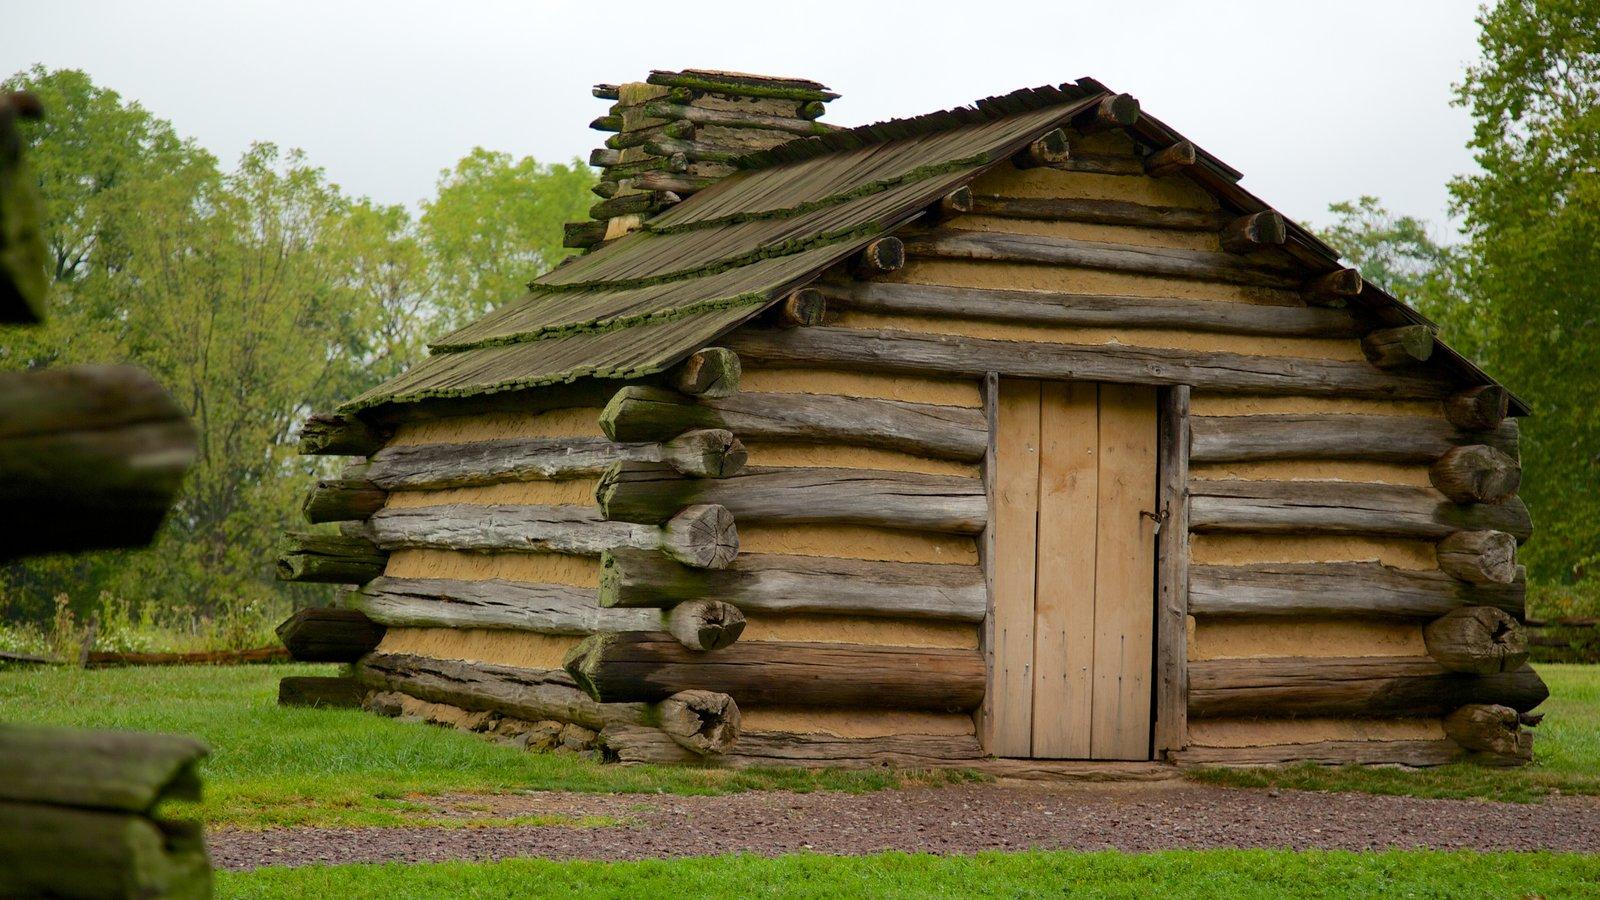 Valley Forge National Historic Park mostrando patrimonio de arquitectura